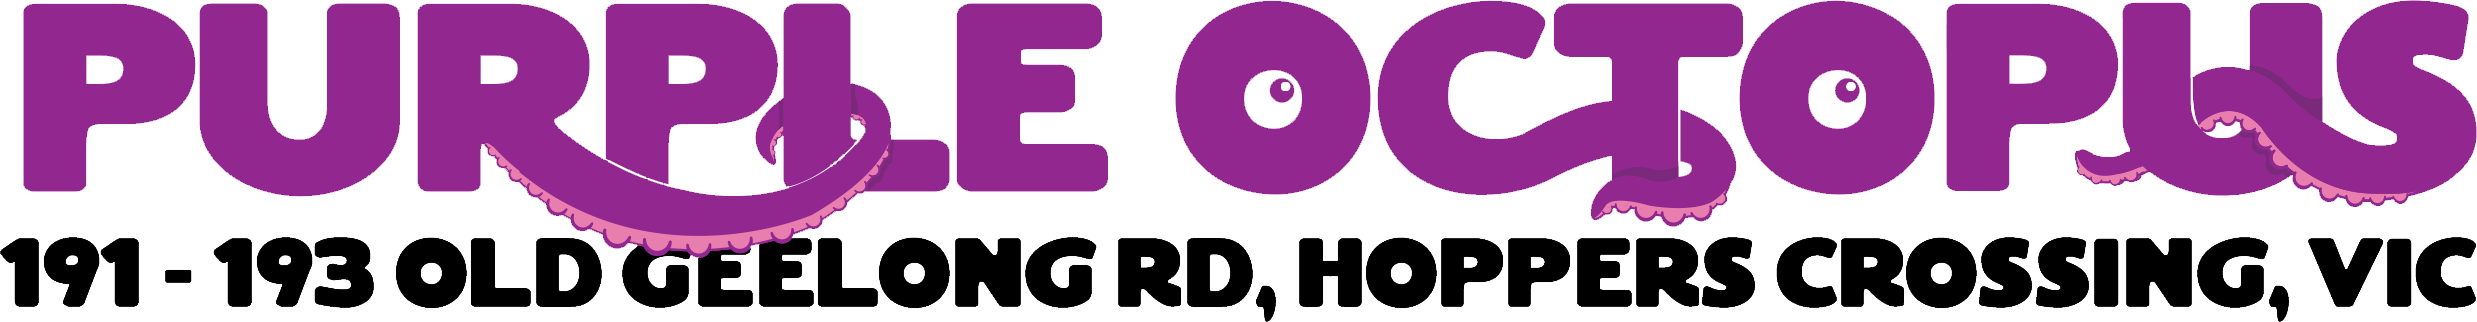 Purple Ocotpus address.png